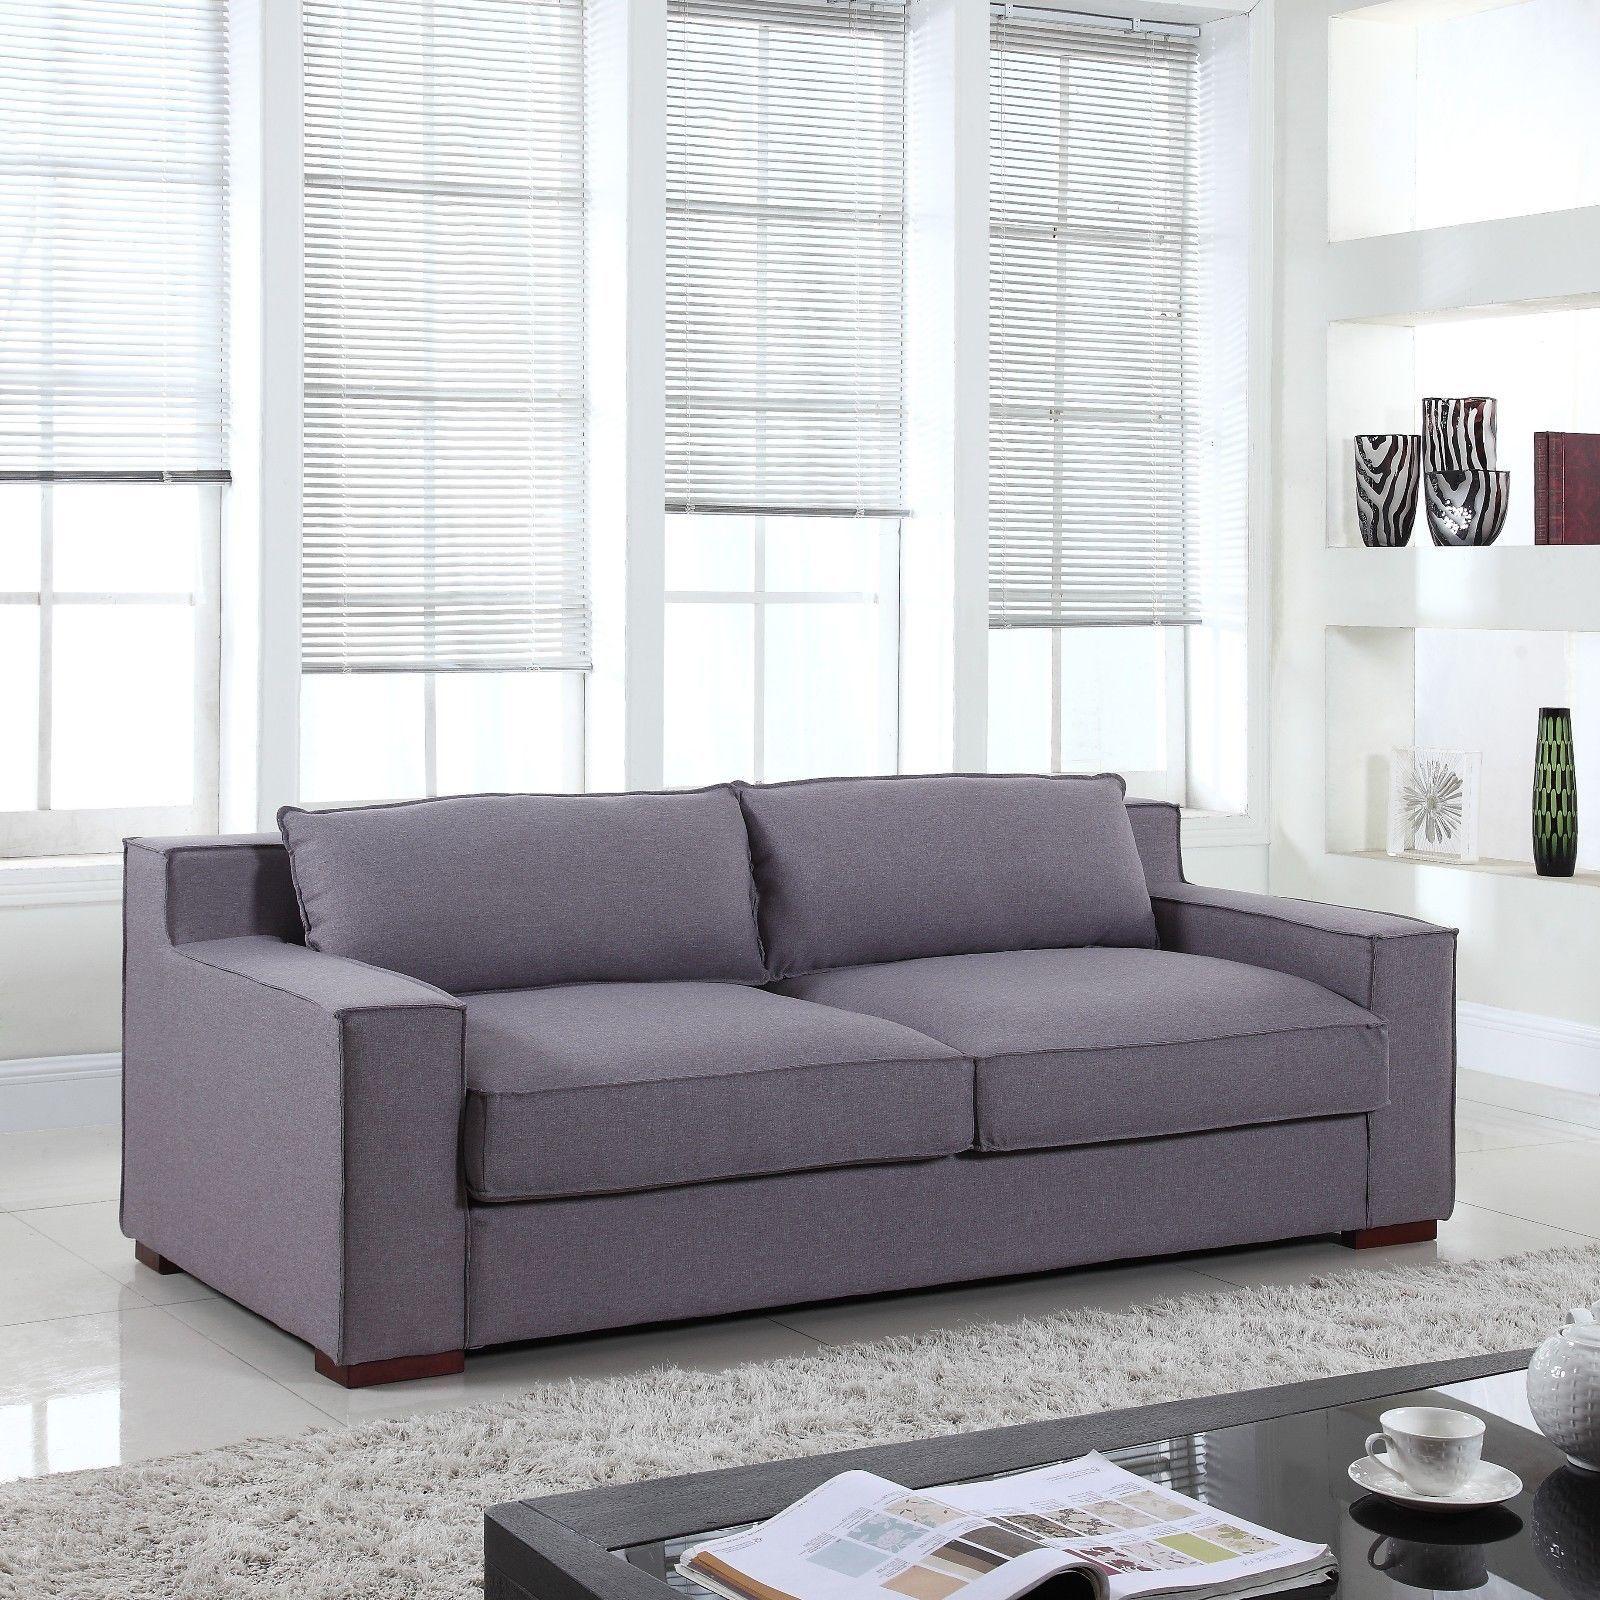 Picture 1 Of 1 Furniture Sofa Deep Sofa